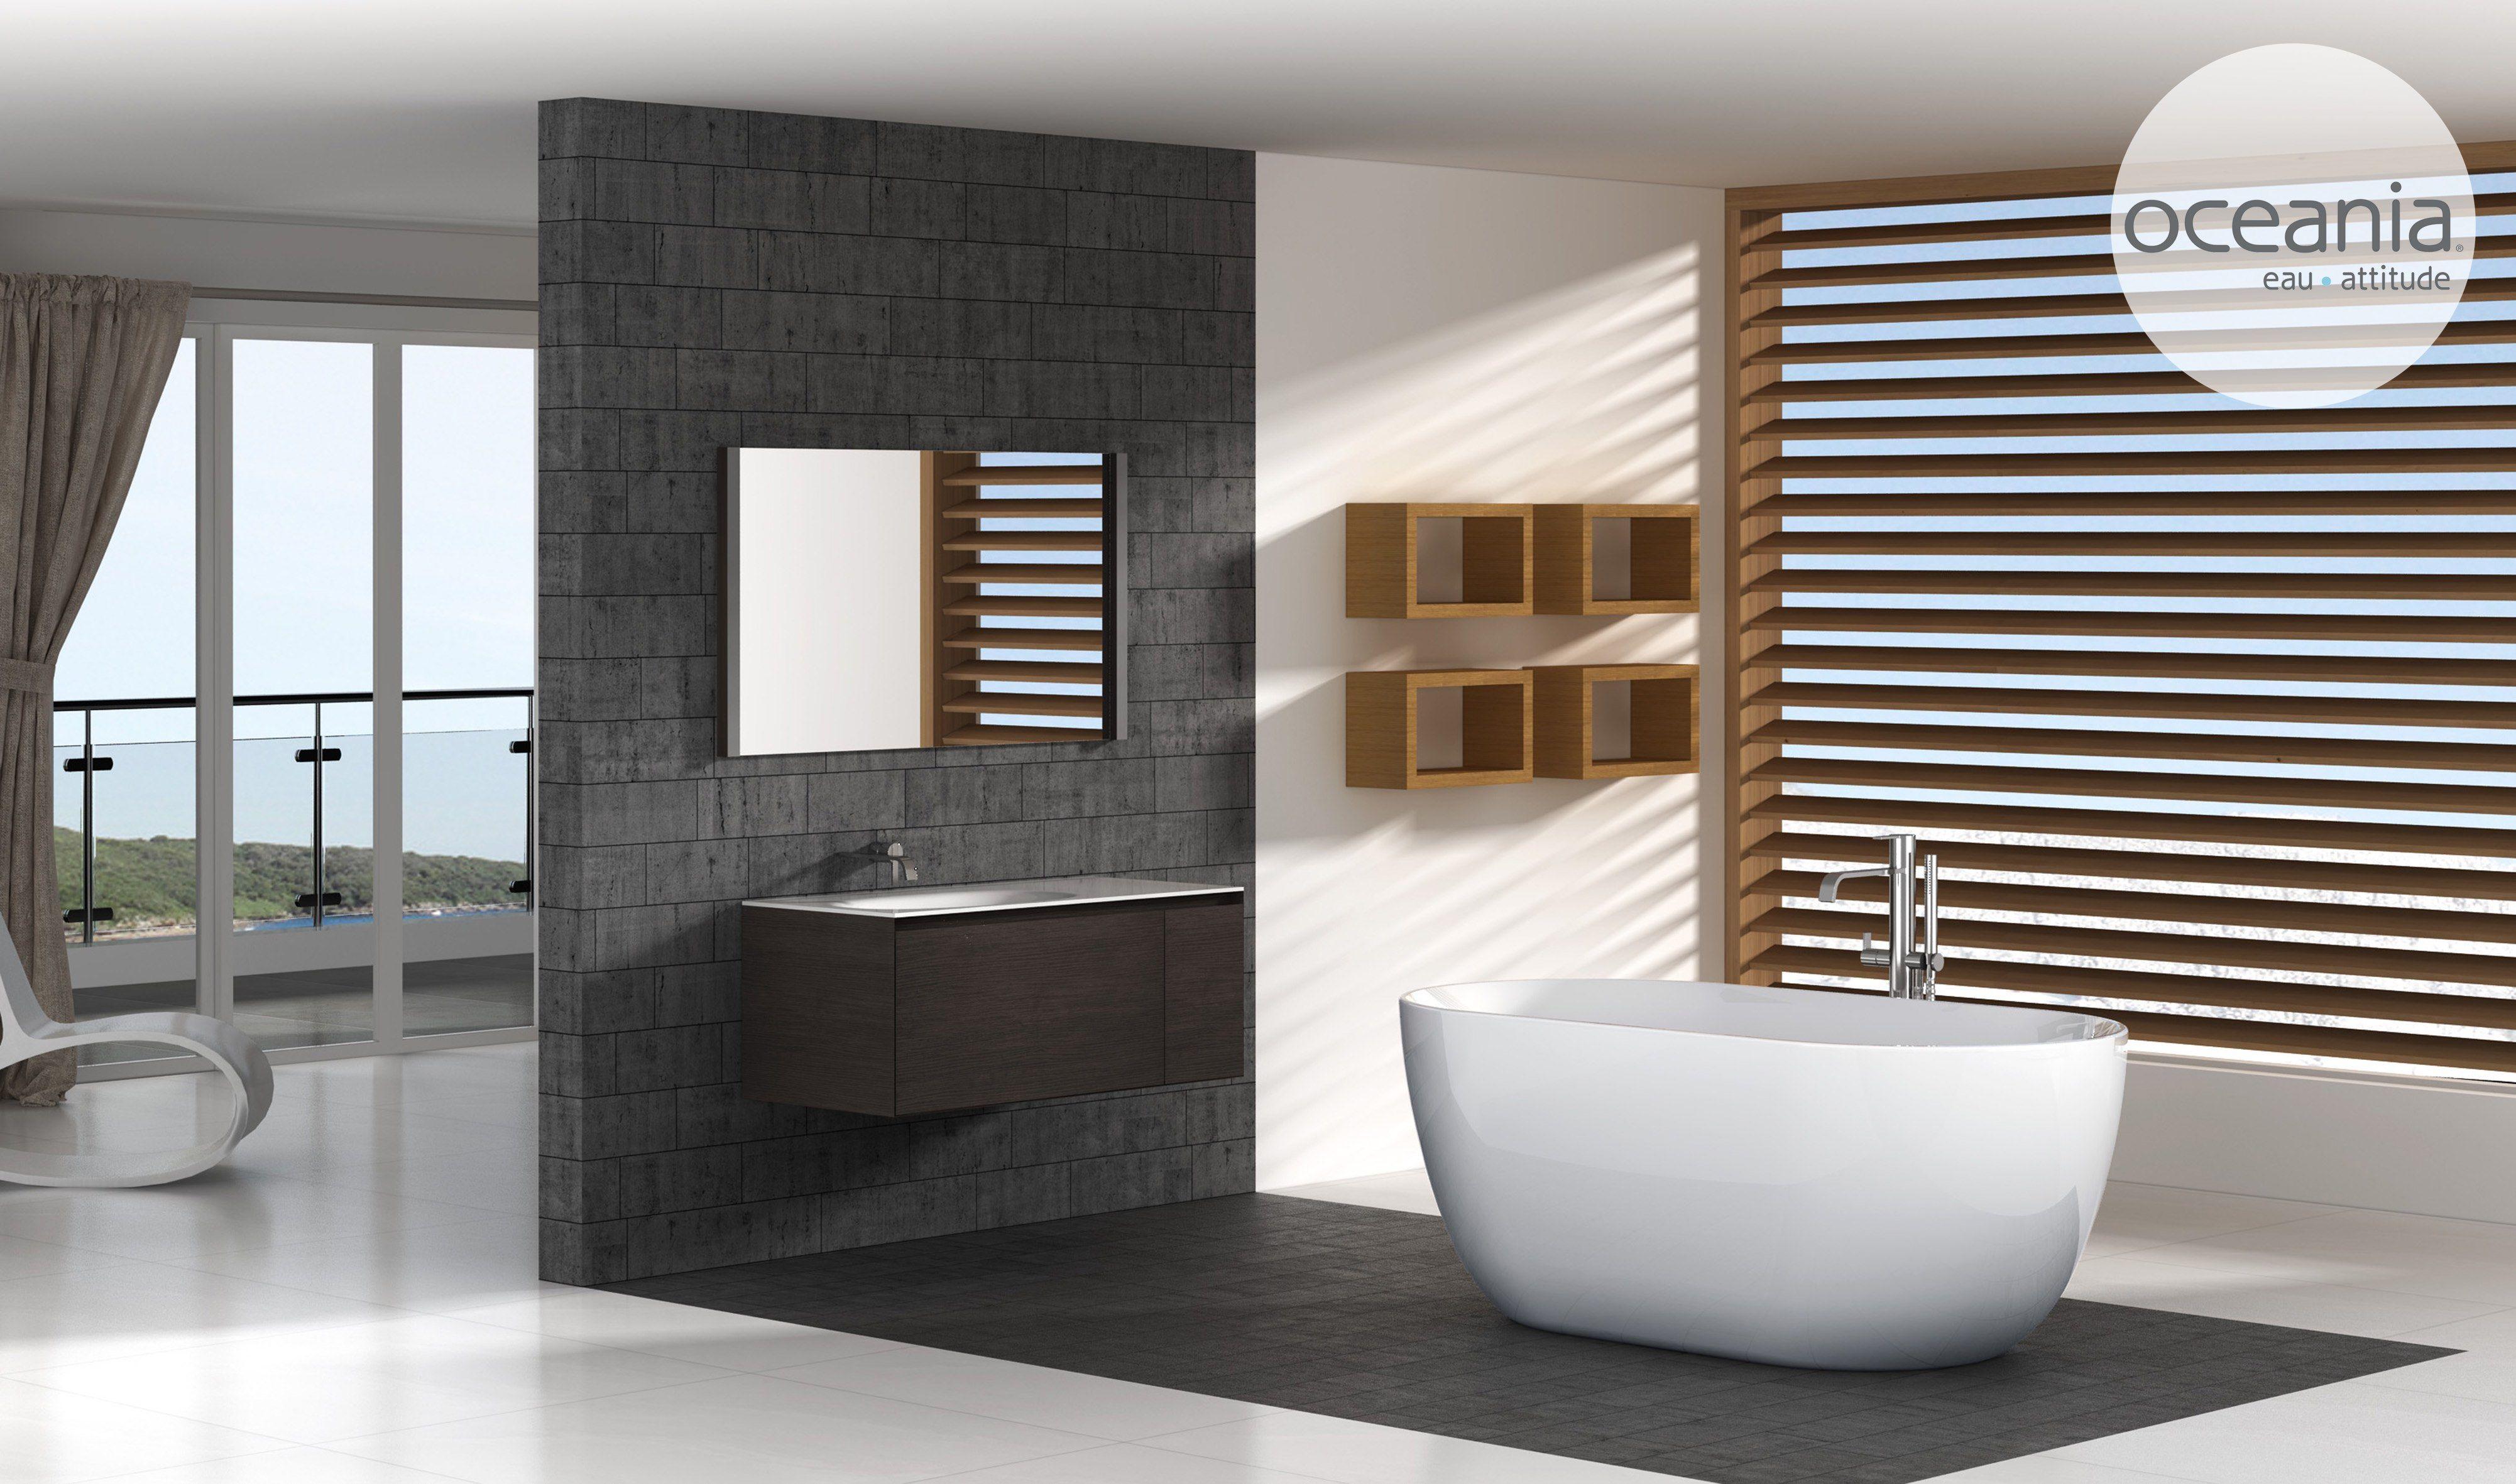 Bain Design Oceania London Bath Baignoire Sur Pied Design De